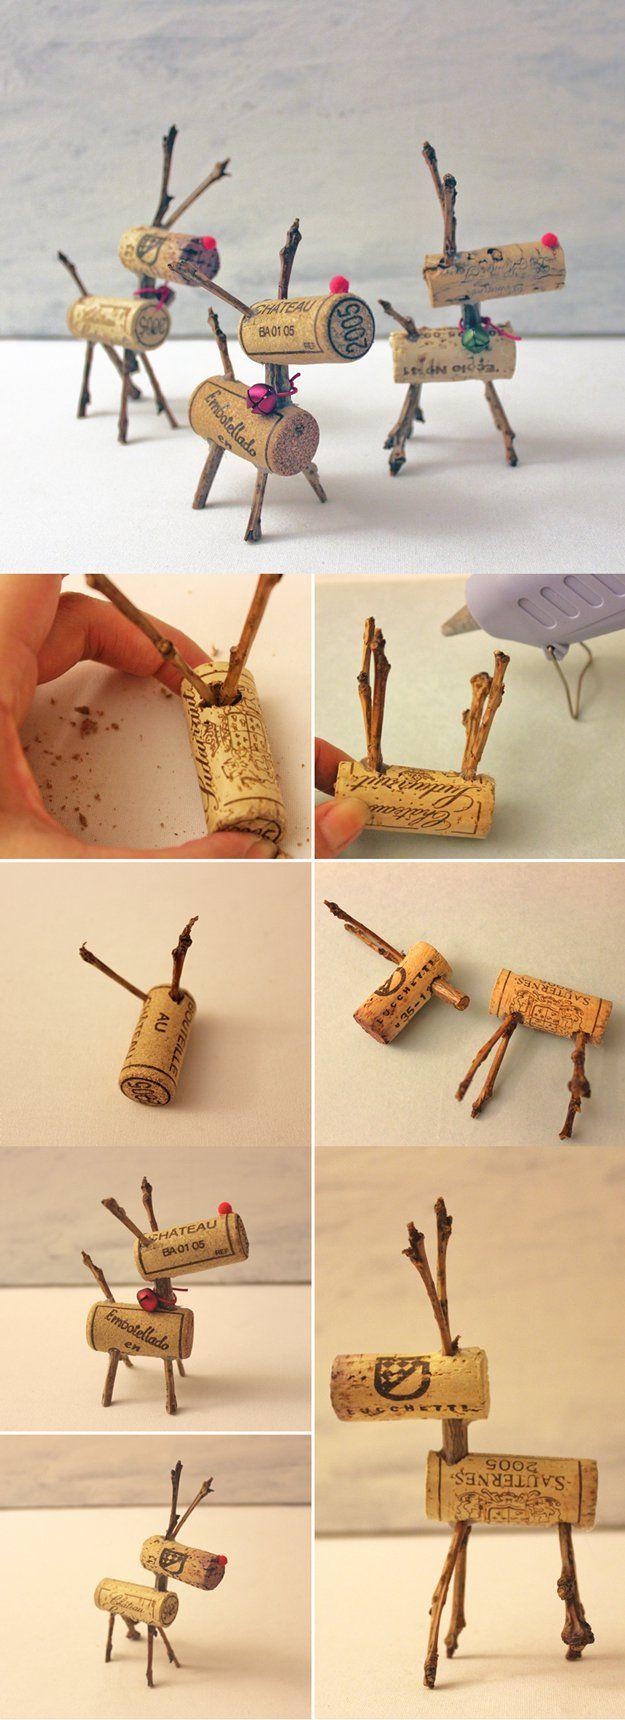 best craft ideas images on pinterest bricolage christmas diy